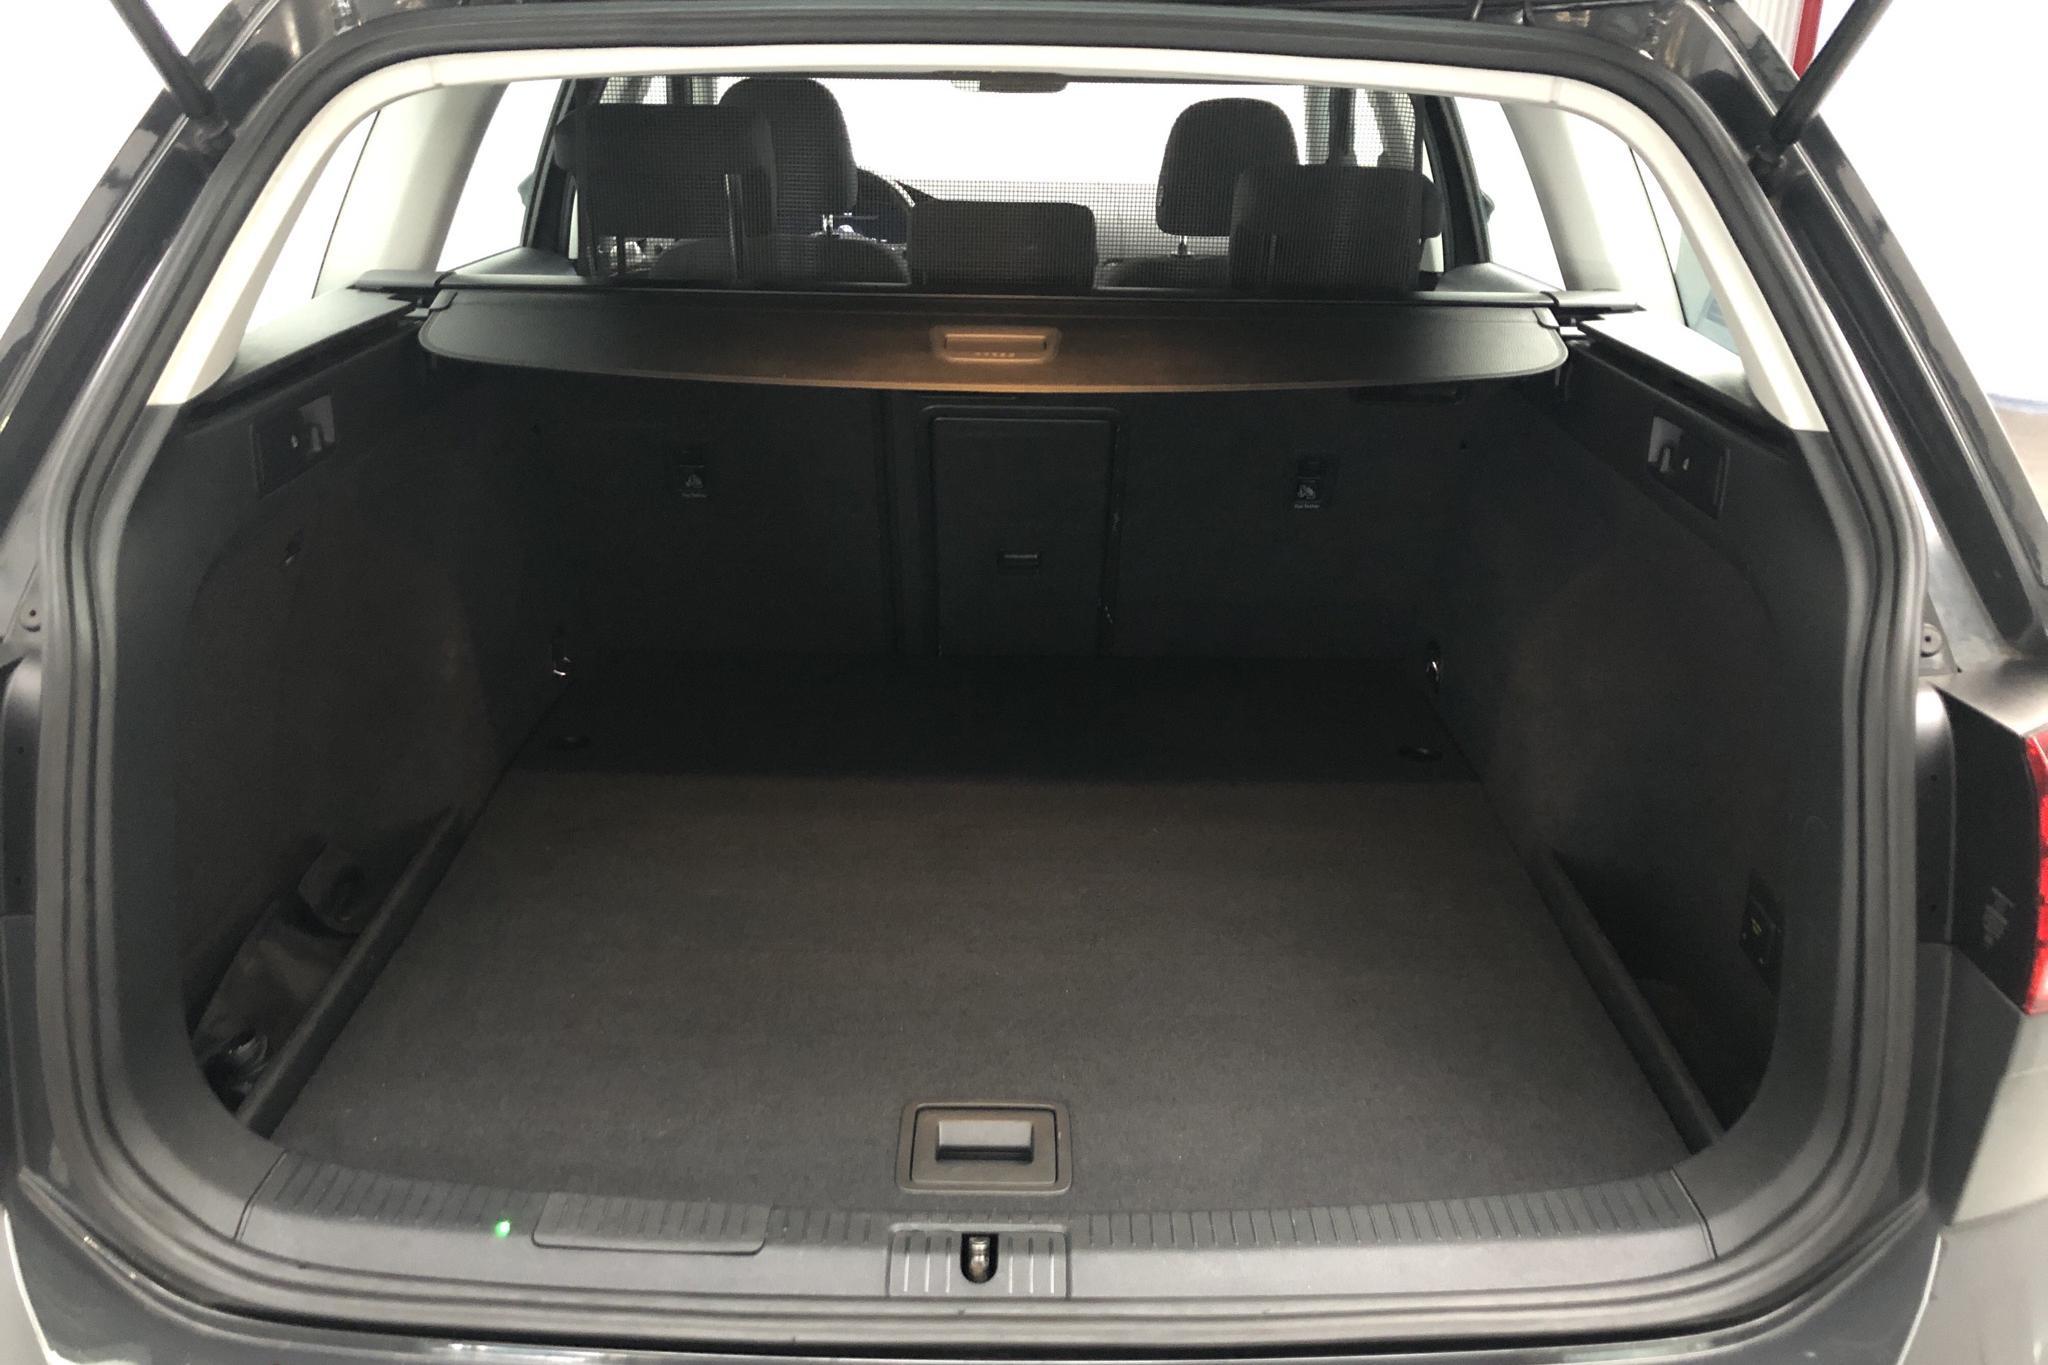 VW Golf VII 2.0 TDI Sportscombi 4MOTION (150hk) - 101 210 km - Manual - Dark Grey - 2018